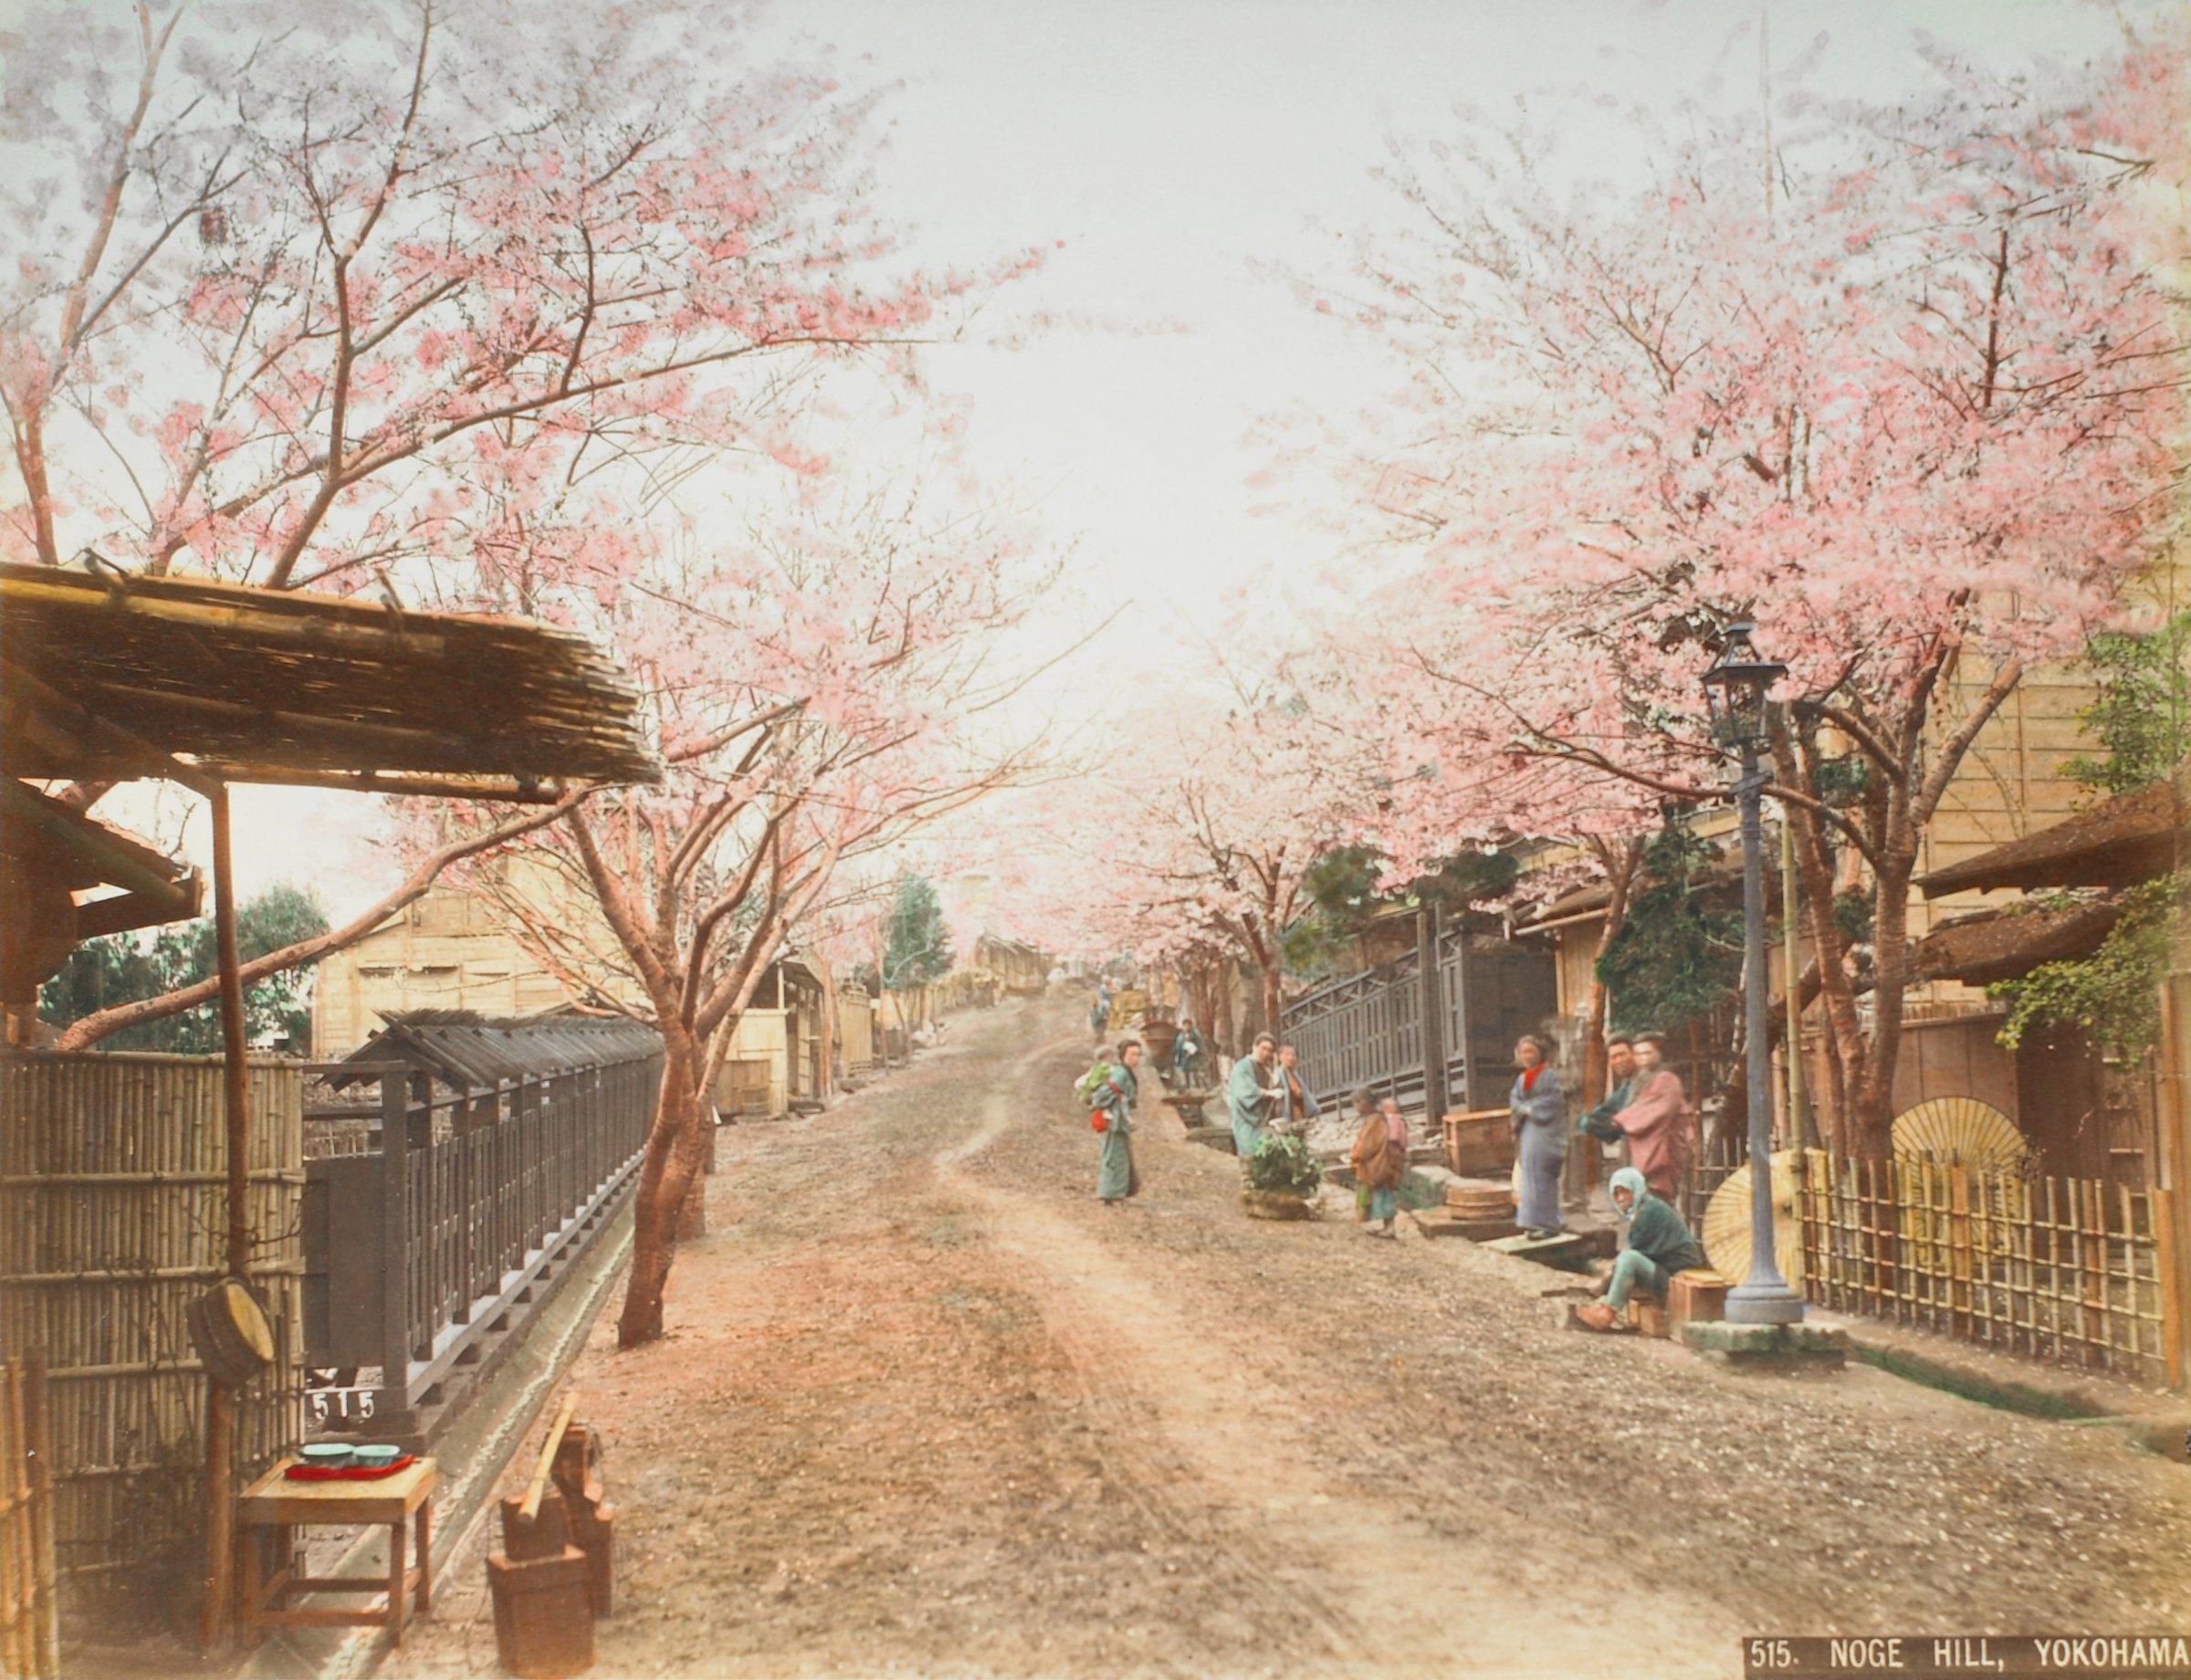 Theatre Street, Yokohama (.22, recto); Noge Hill, Yokohama (.23, verso), Attributed to Kusakabe Kimbei, hand-colored albumen prints mounted to album page